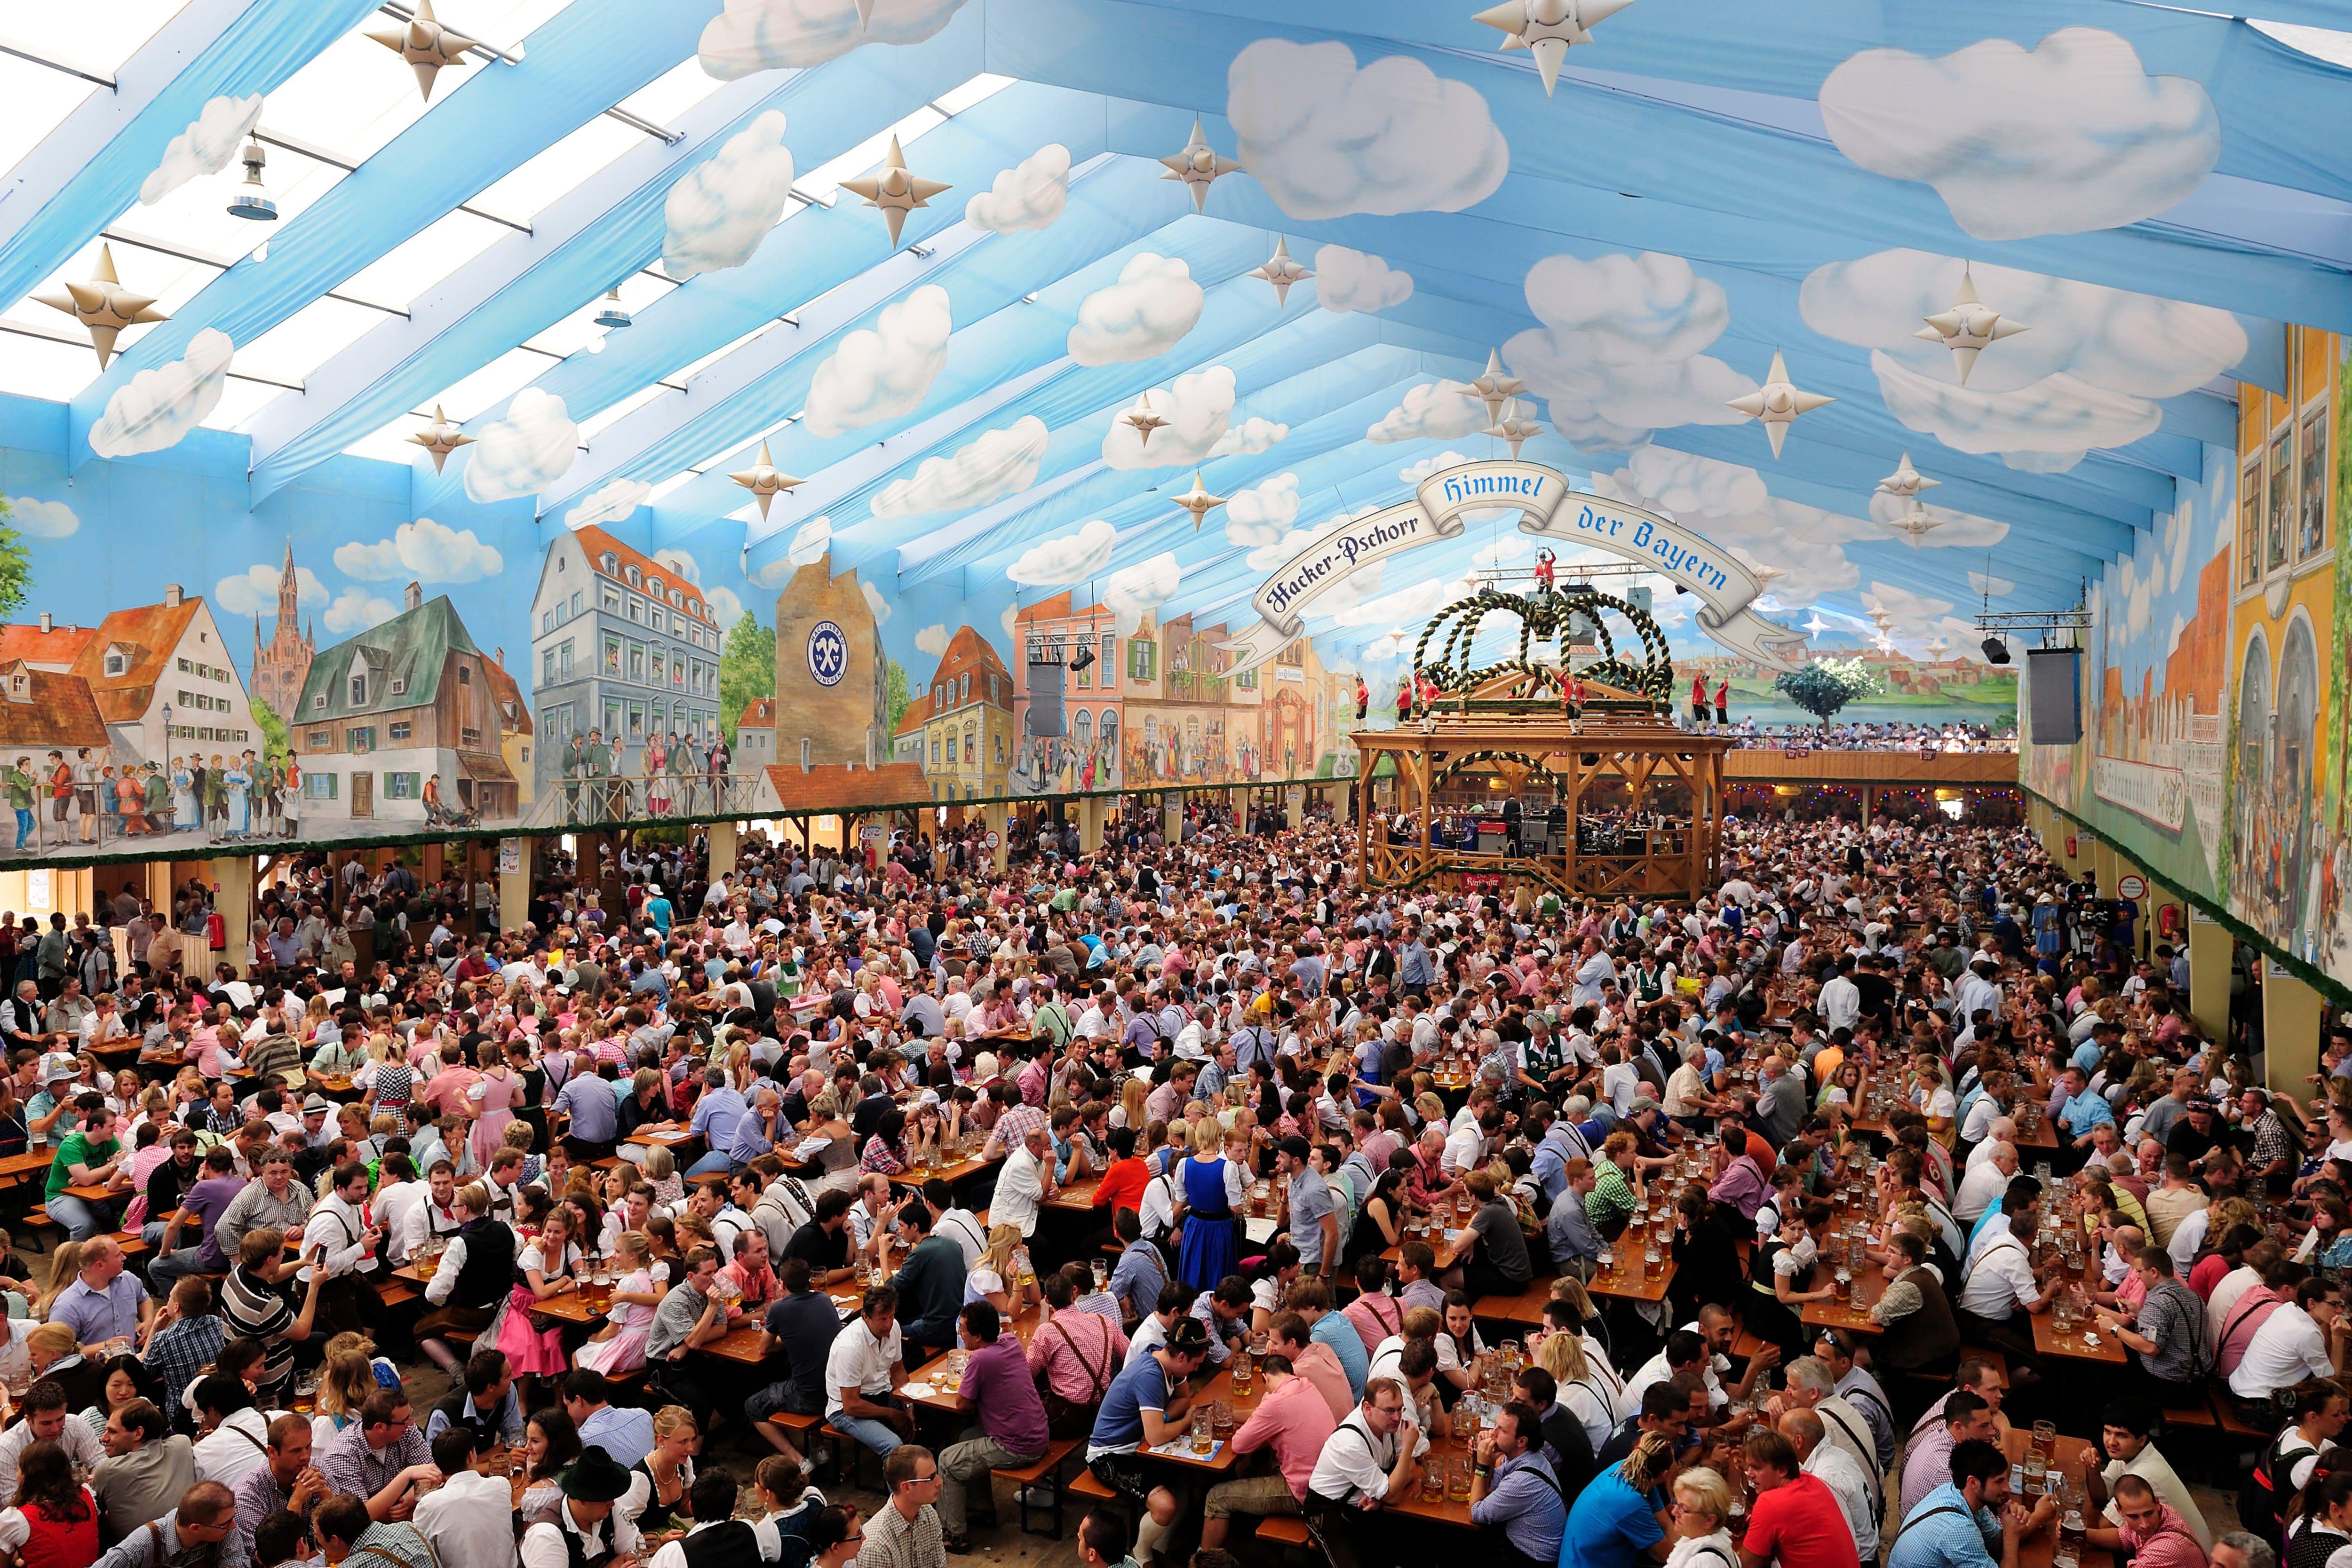 Oktoberfest tent full of people